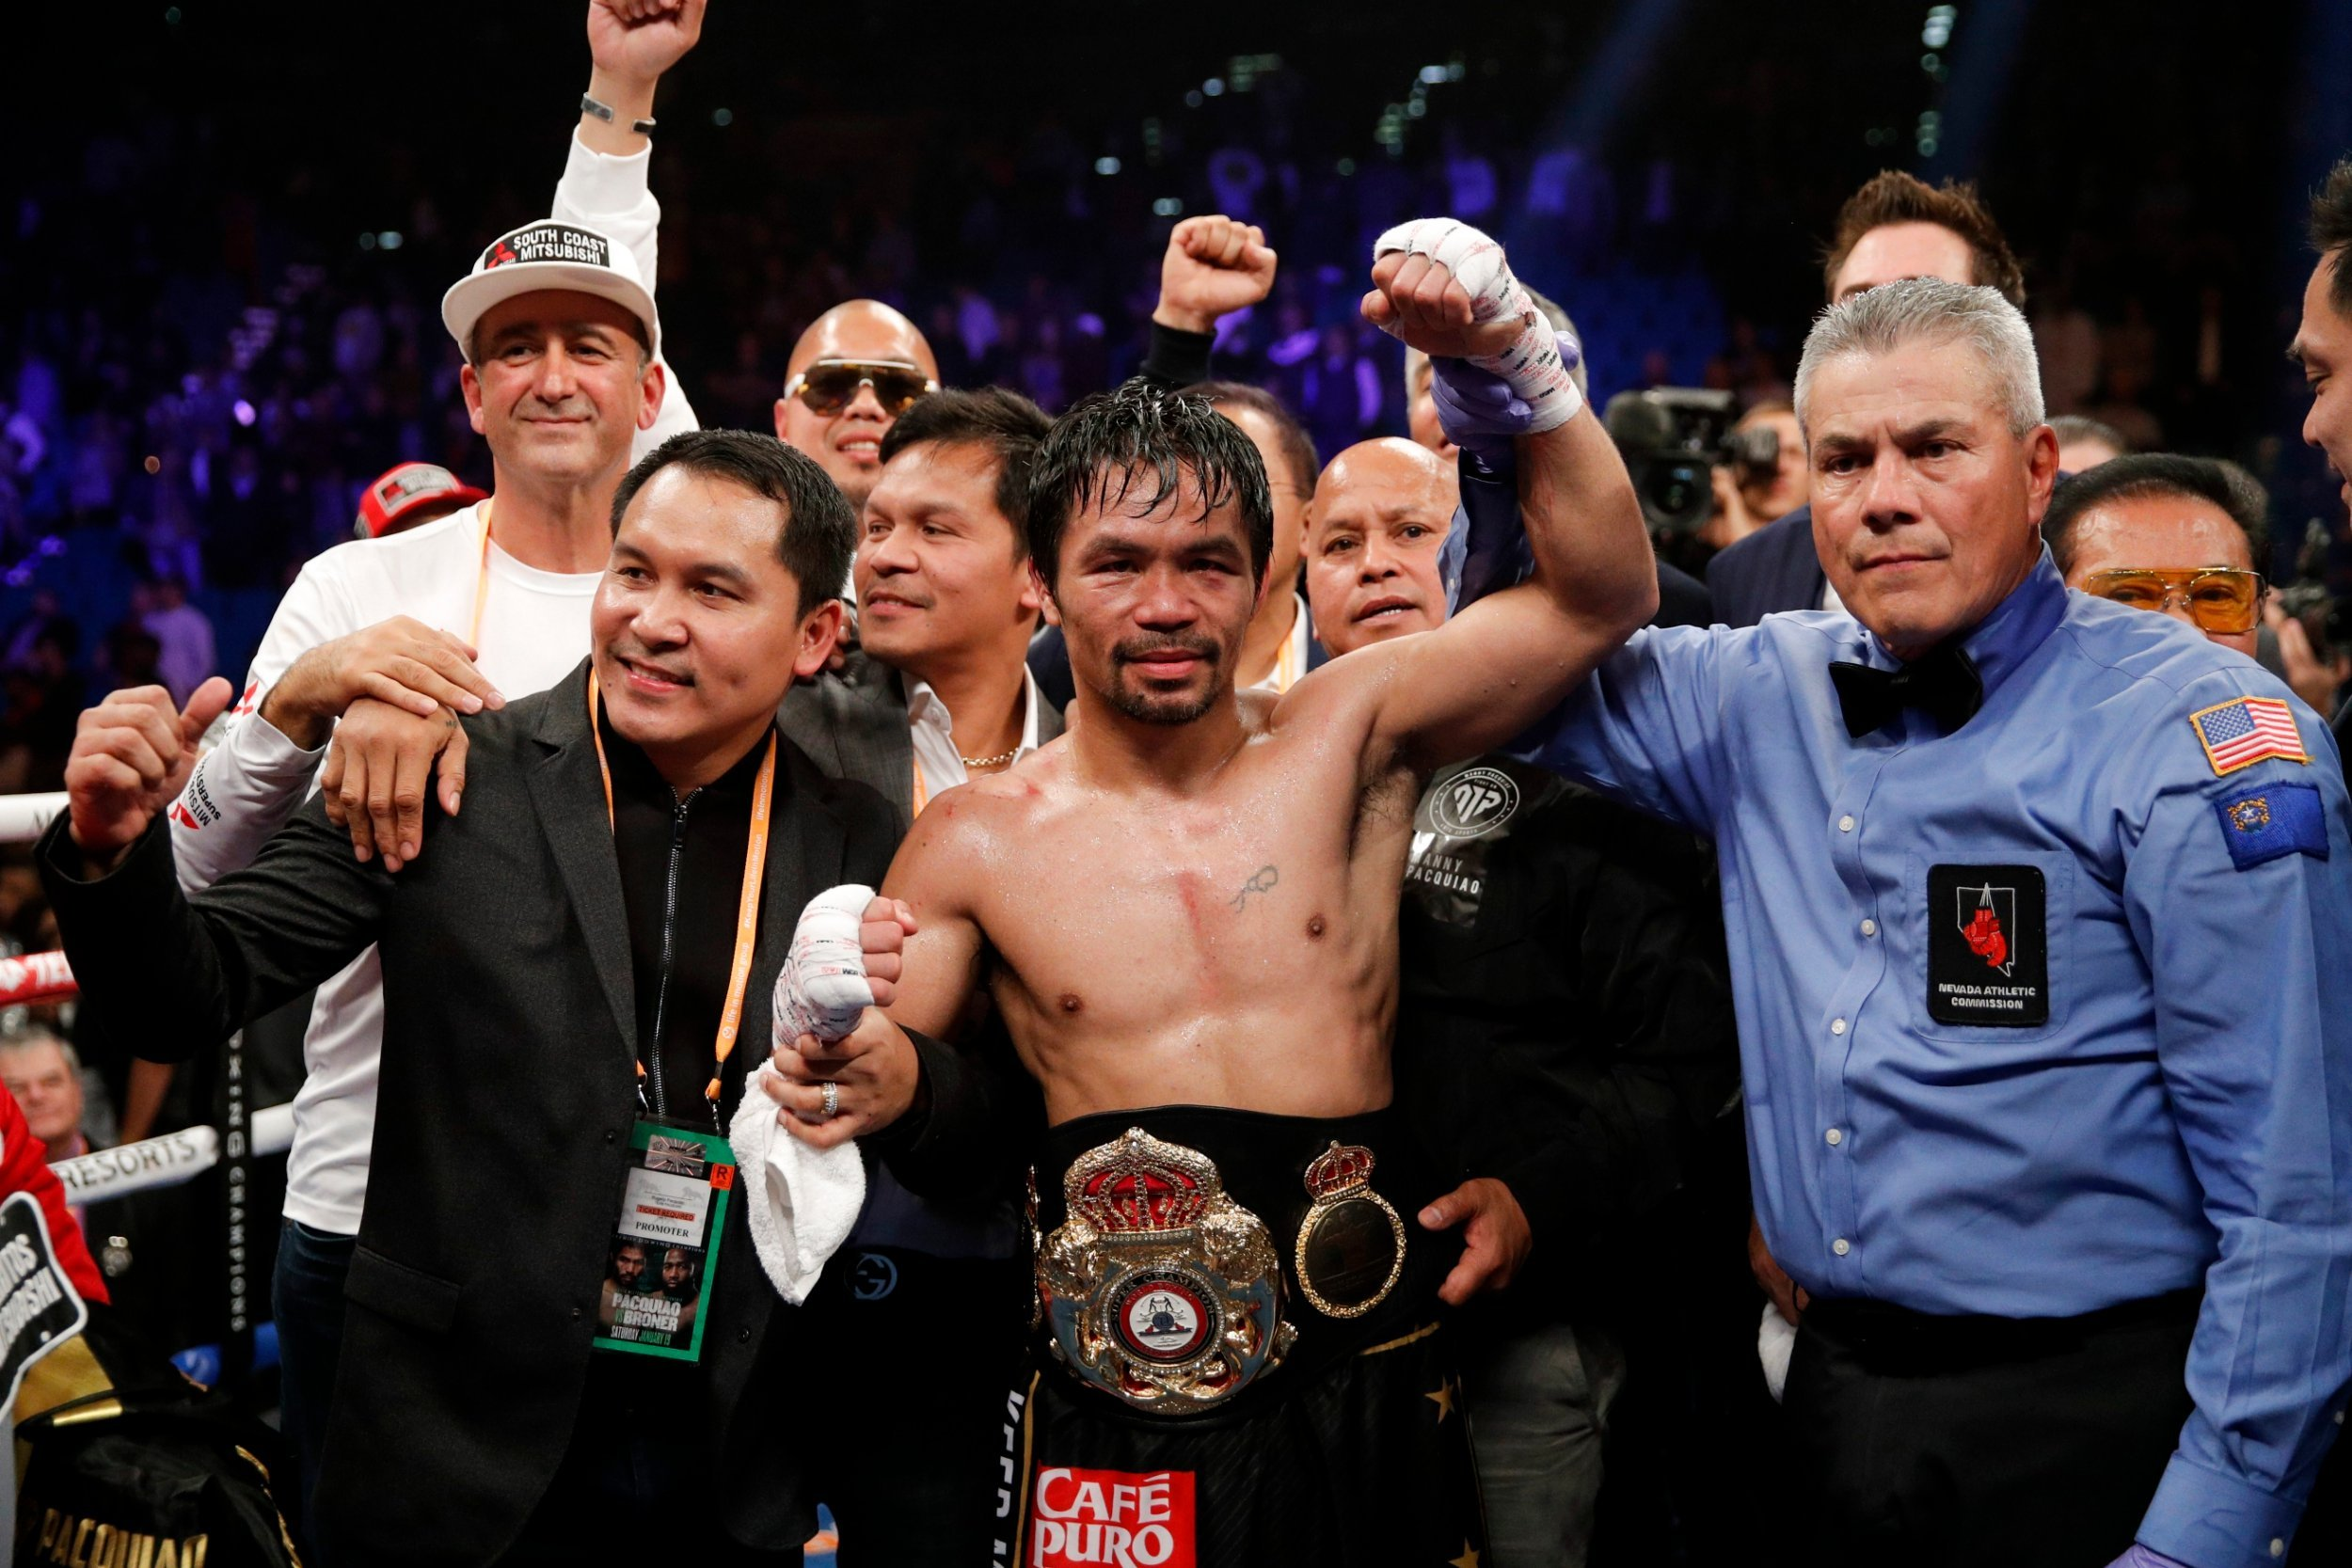 HustleTV.tv Manny Pacquiao Win Over Adrien Broner DJ Hustle